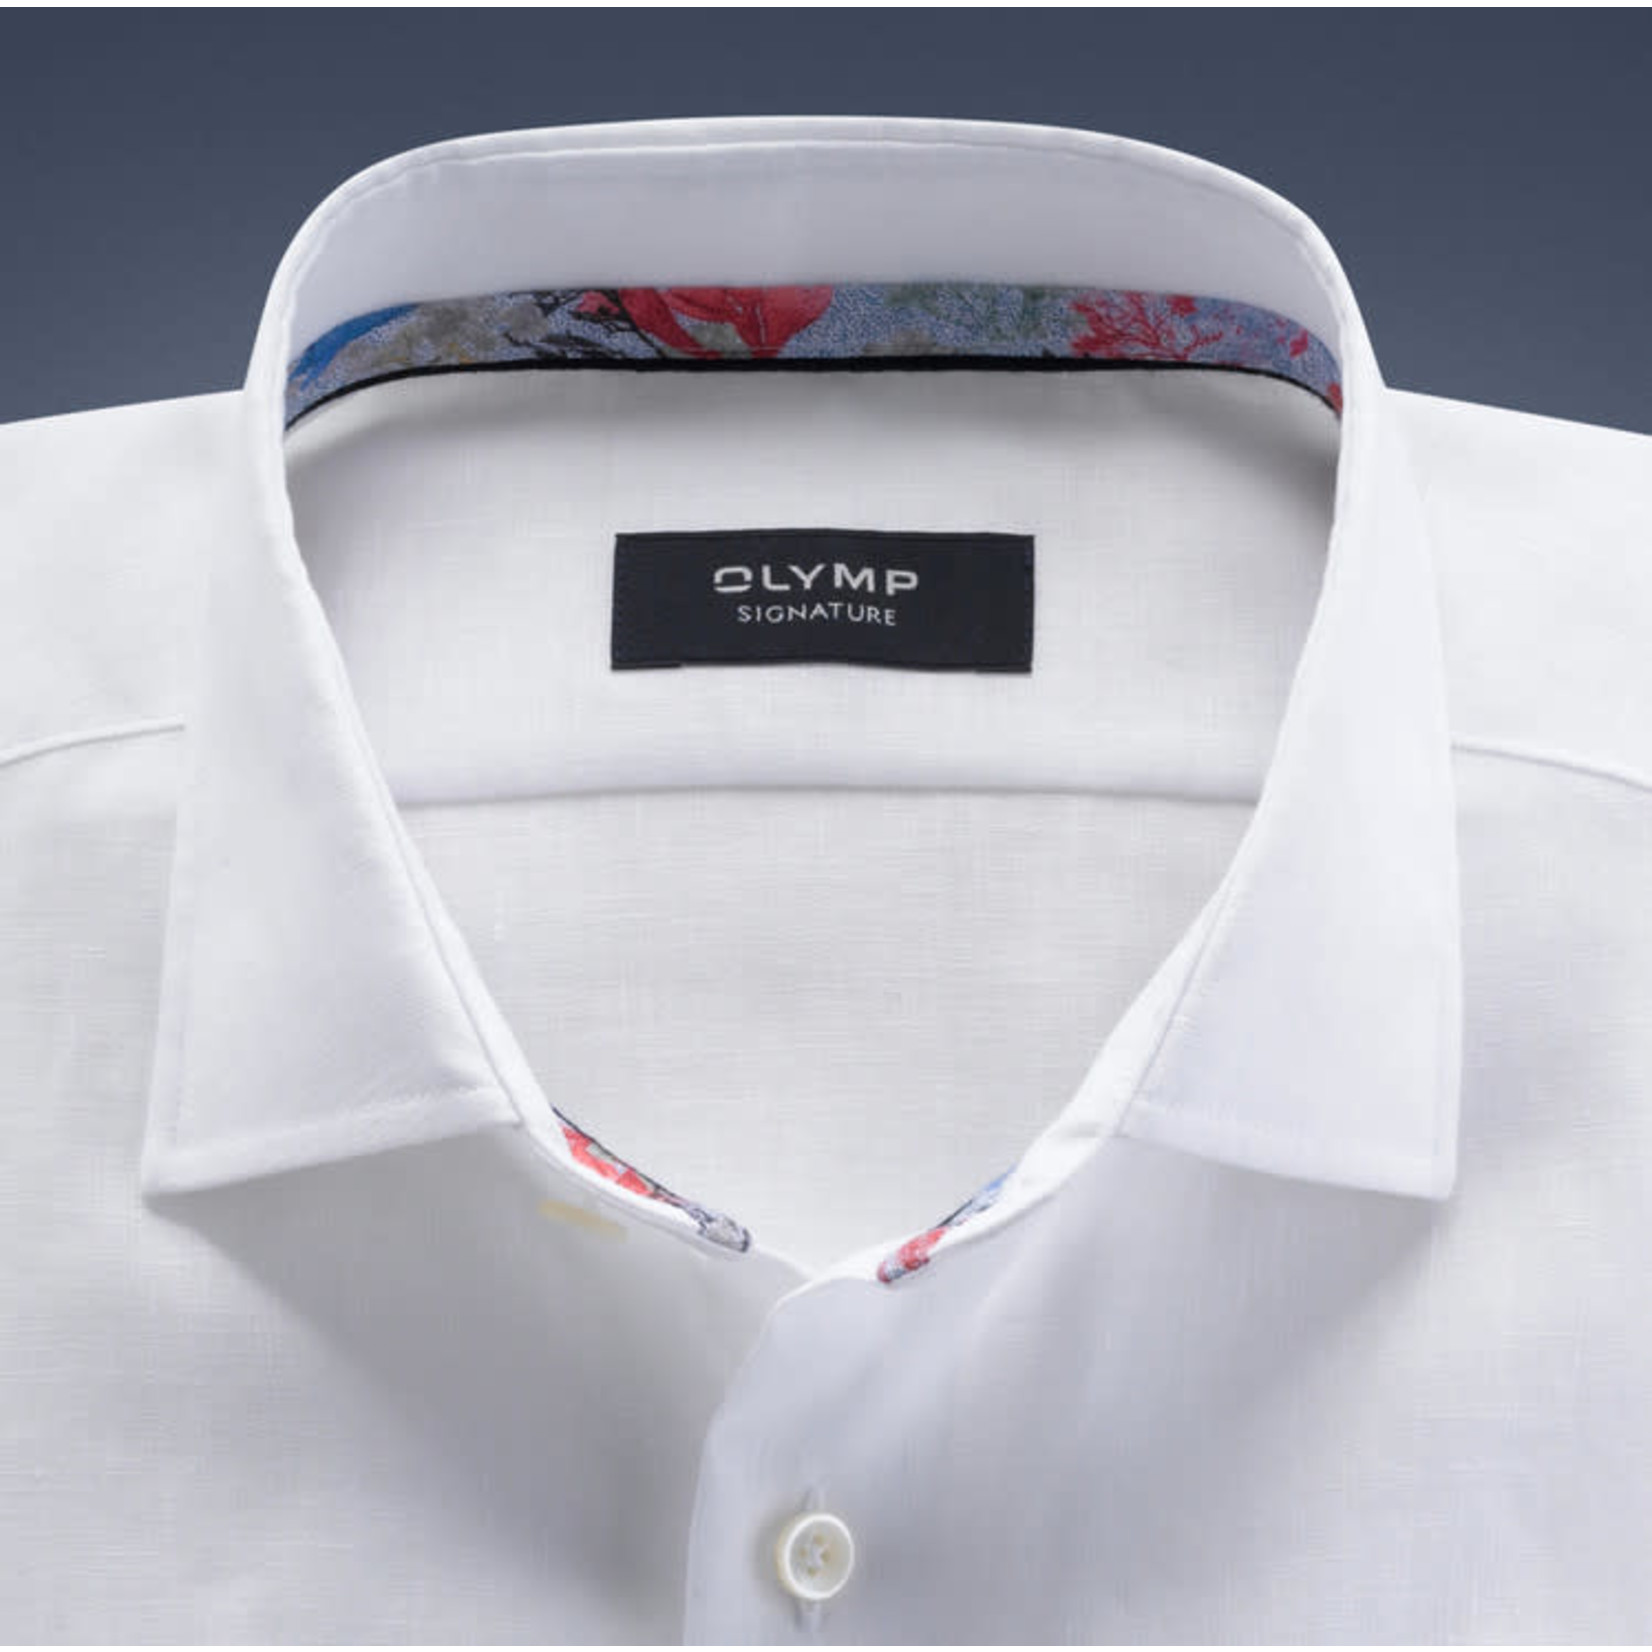 Olymp Signature linnen overhemd wit